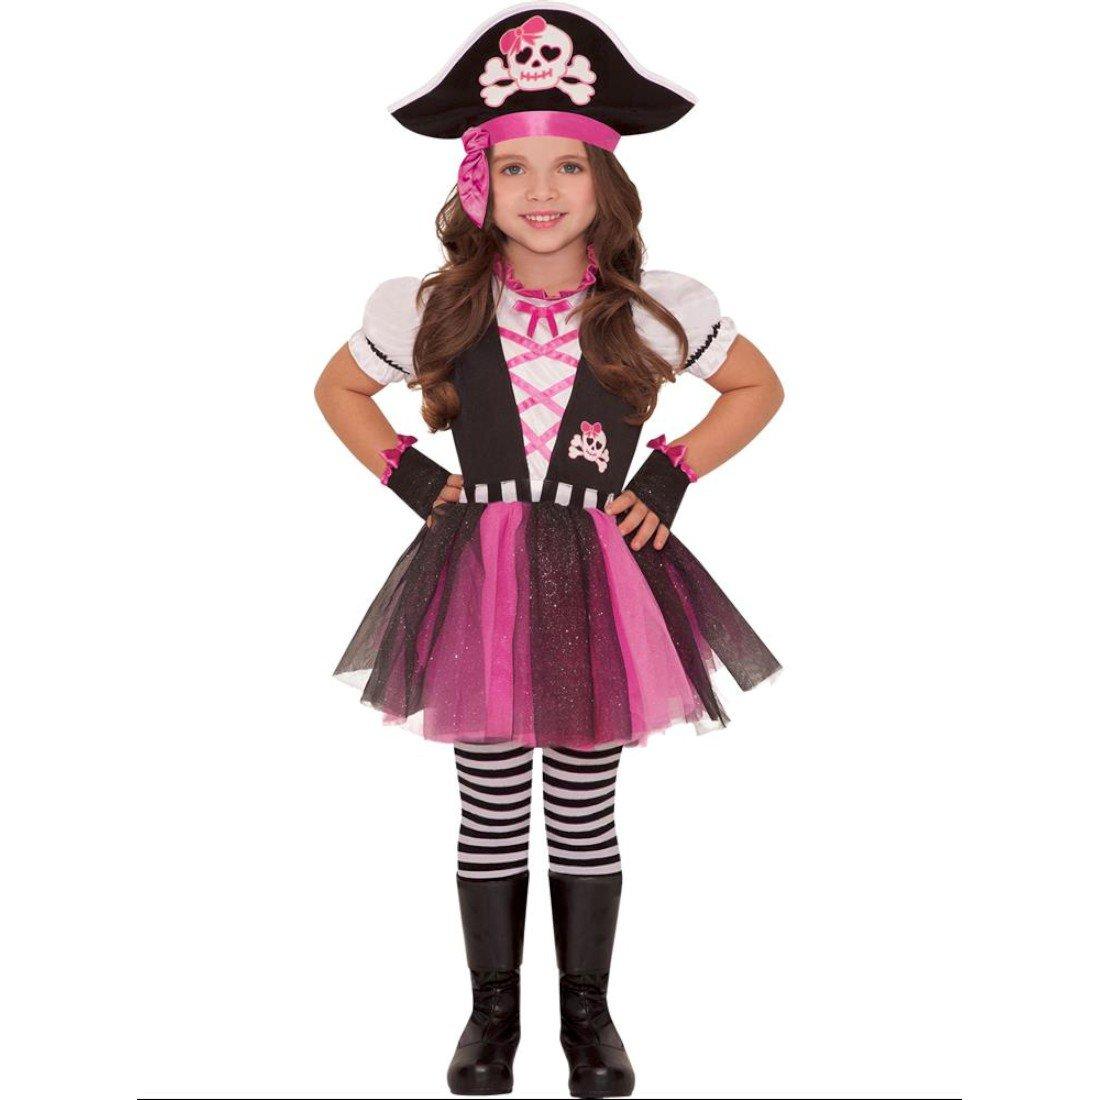 Amscan International - Disfraz infantil pirata (999697): Amazon.es ...